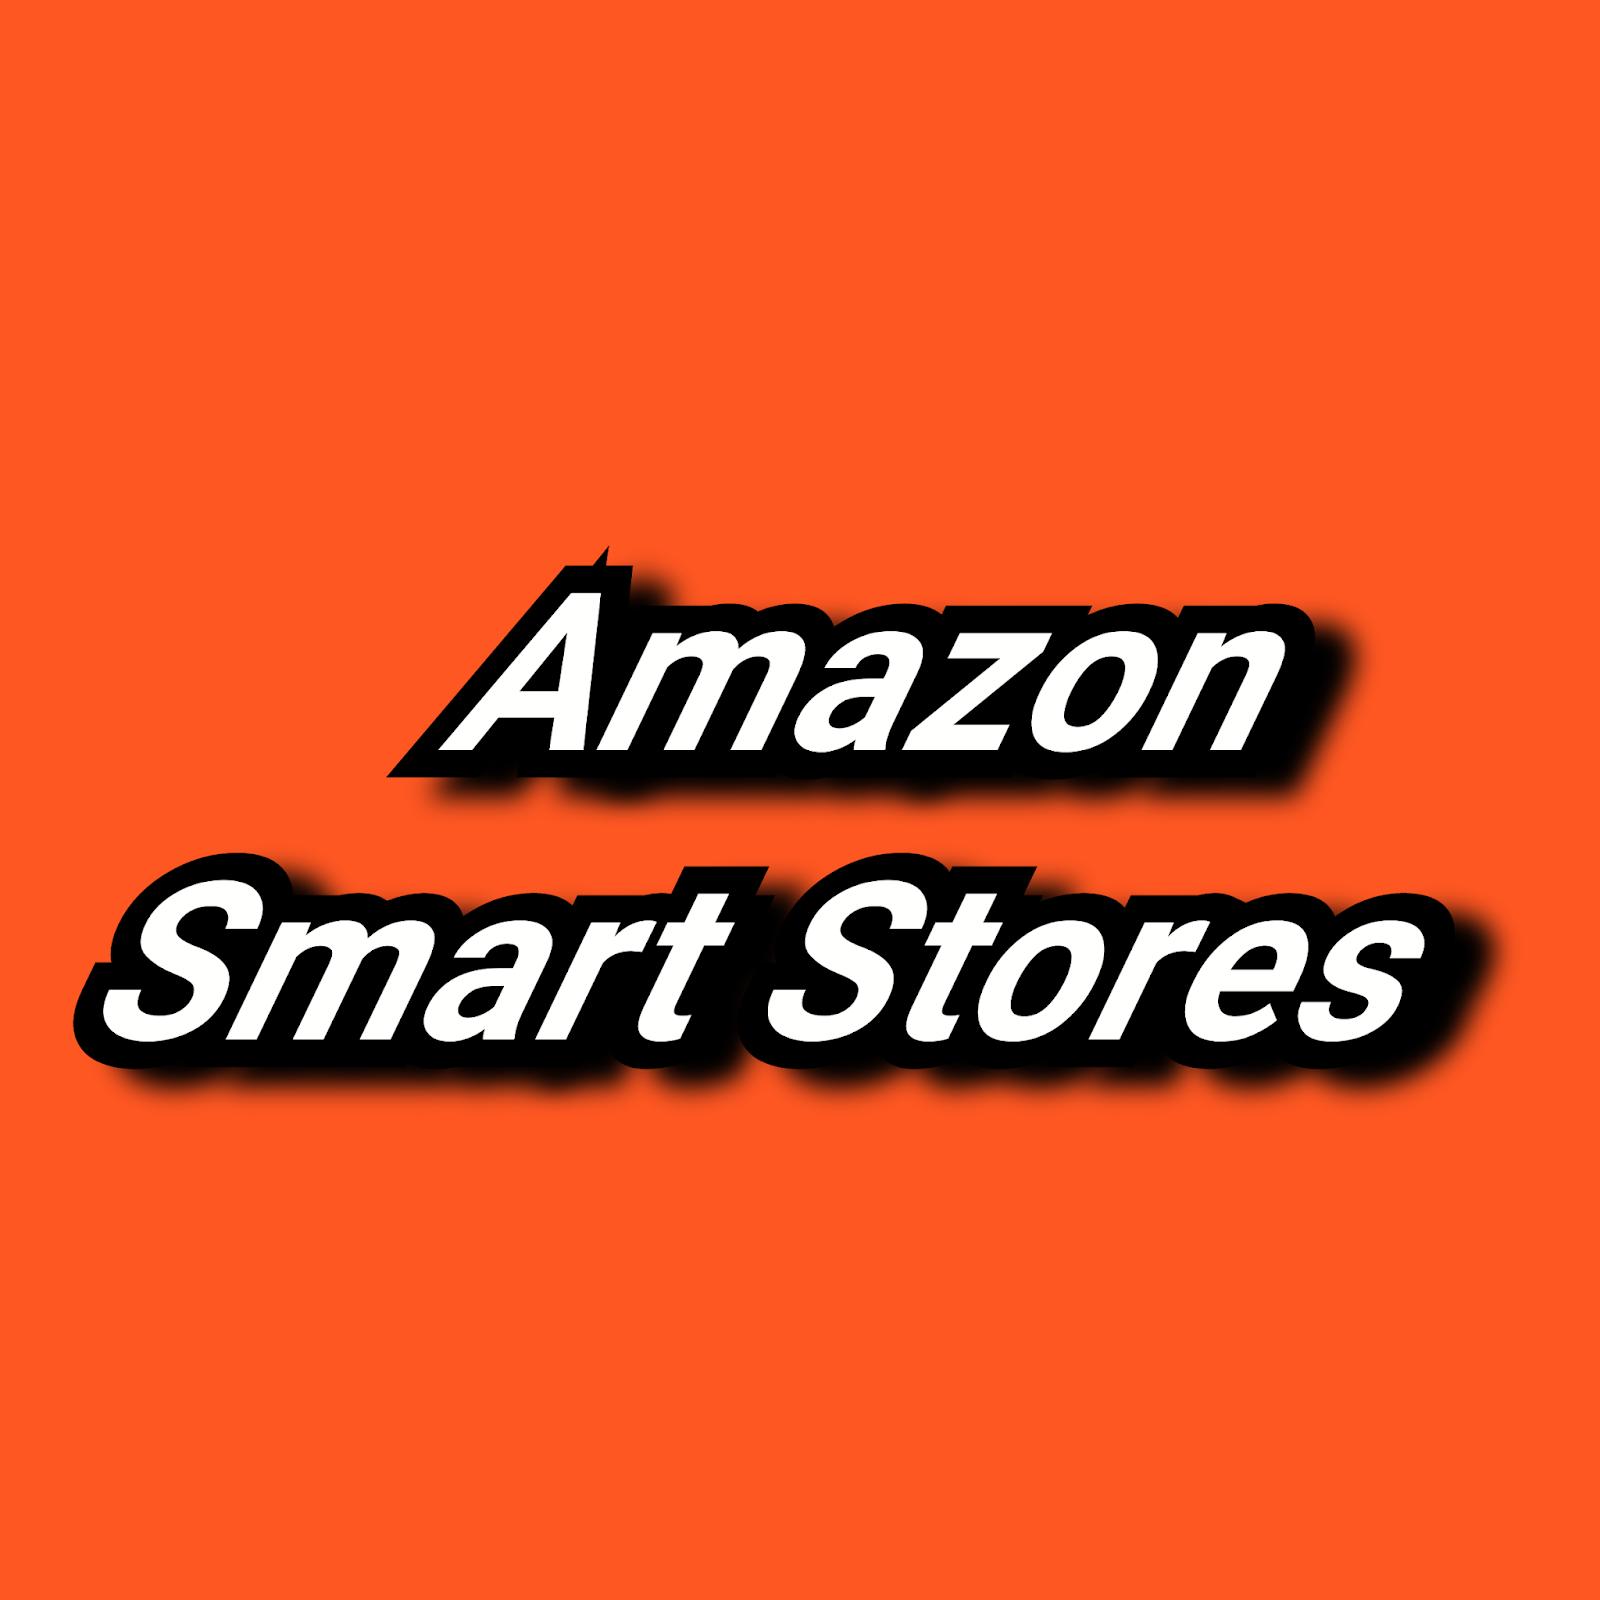 Amazon Smart Stores Kya hai